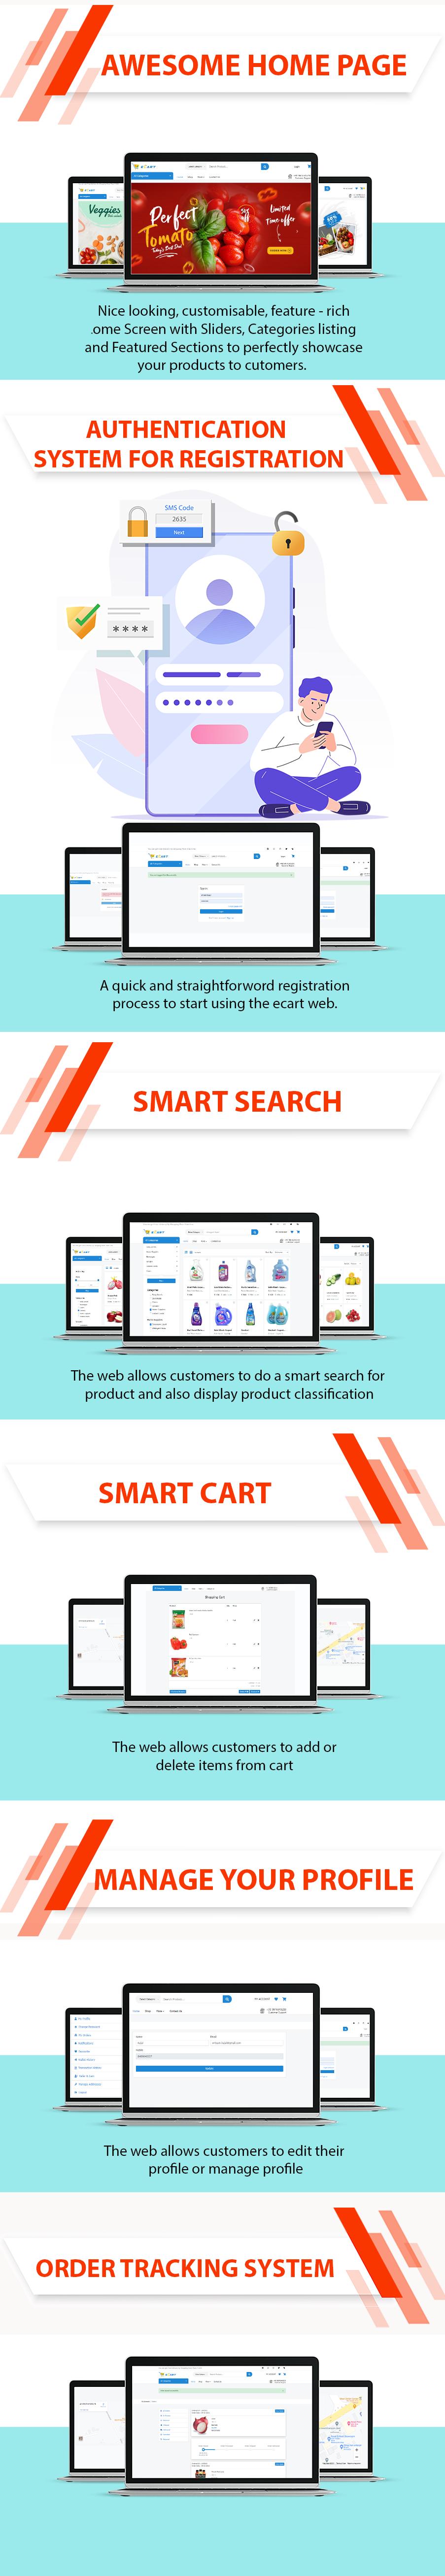 eCart Web - Ecommerce/Store Full Website - 9